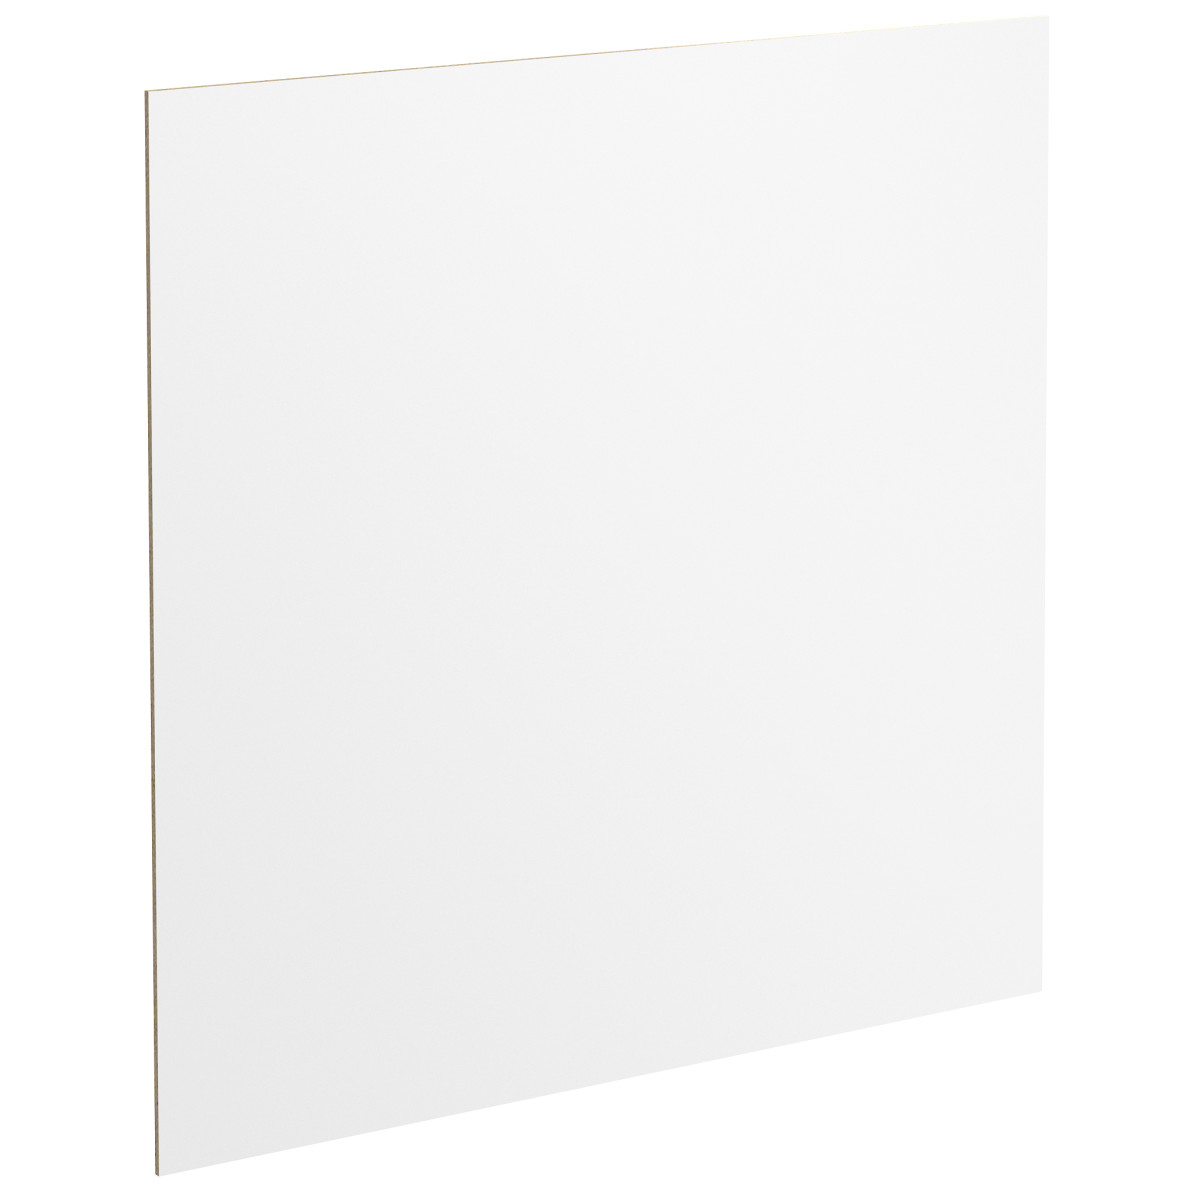 Задняя стенка SPACEO KUB 44х35.8 см МДФ цвет белый